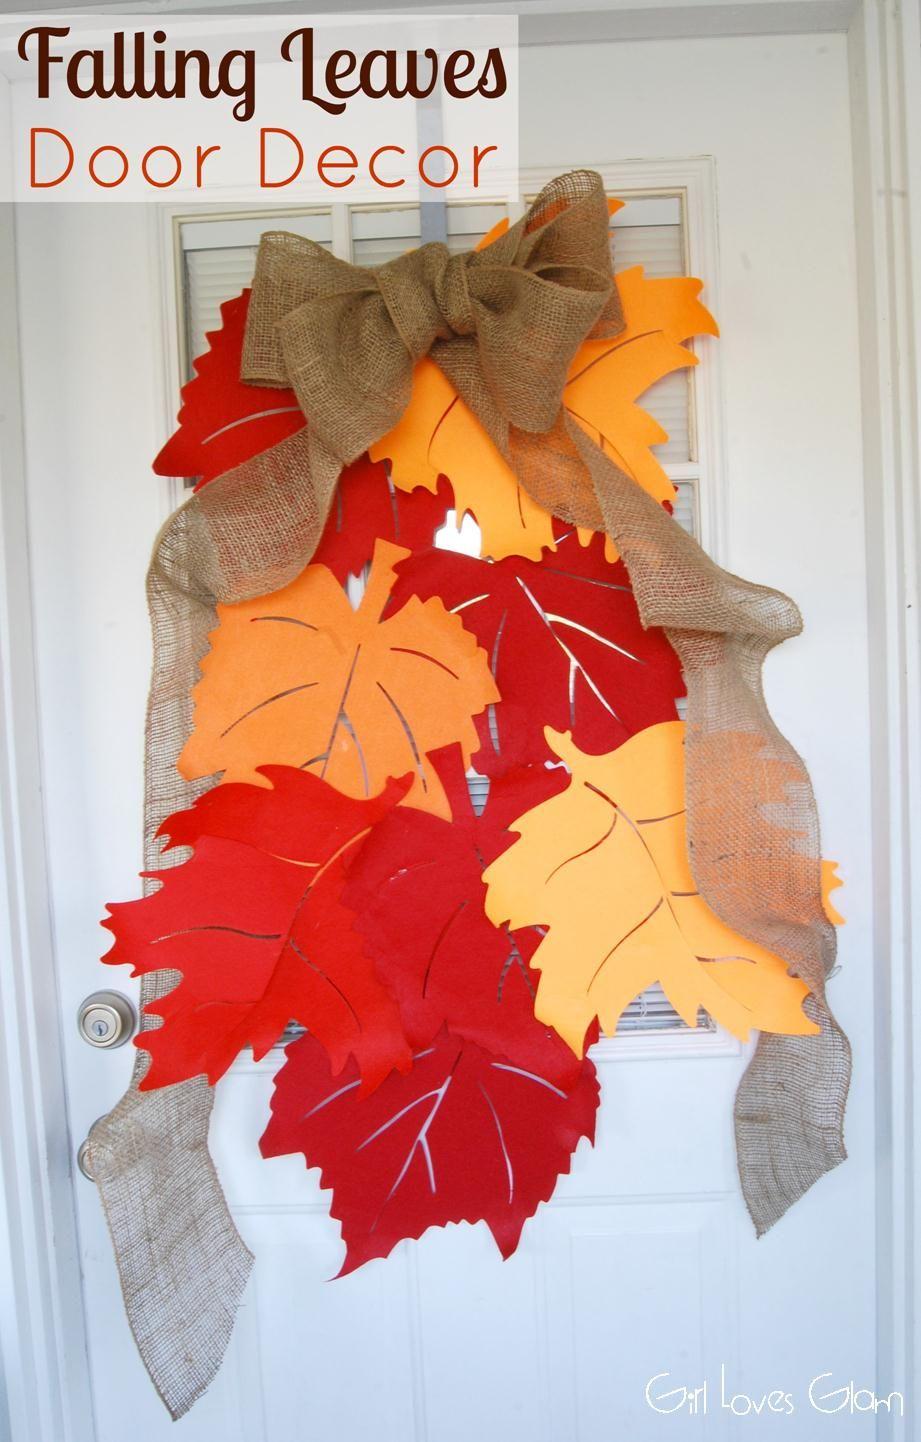 Falling Leaves Door Decor Tutorial Fall diy, Fall crafts